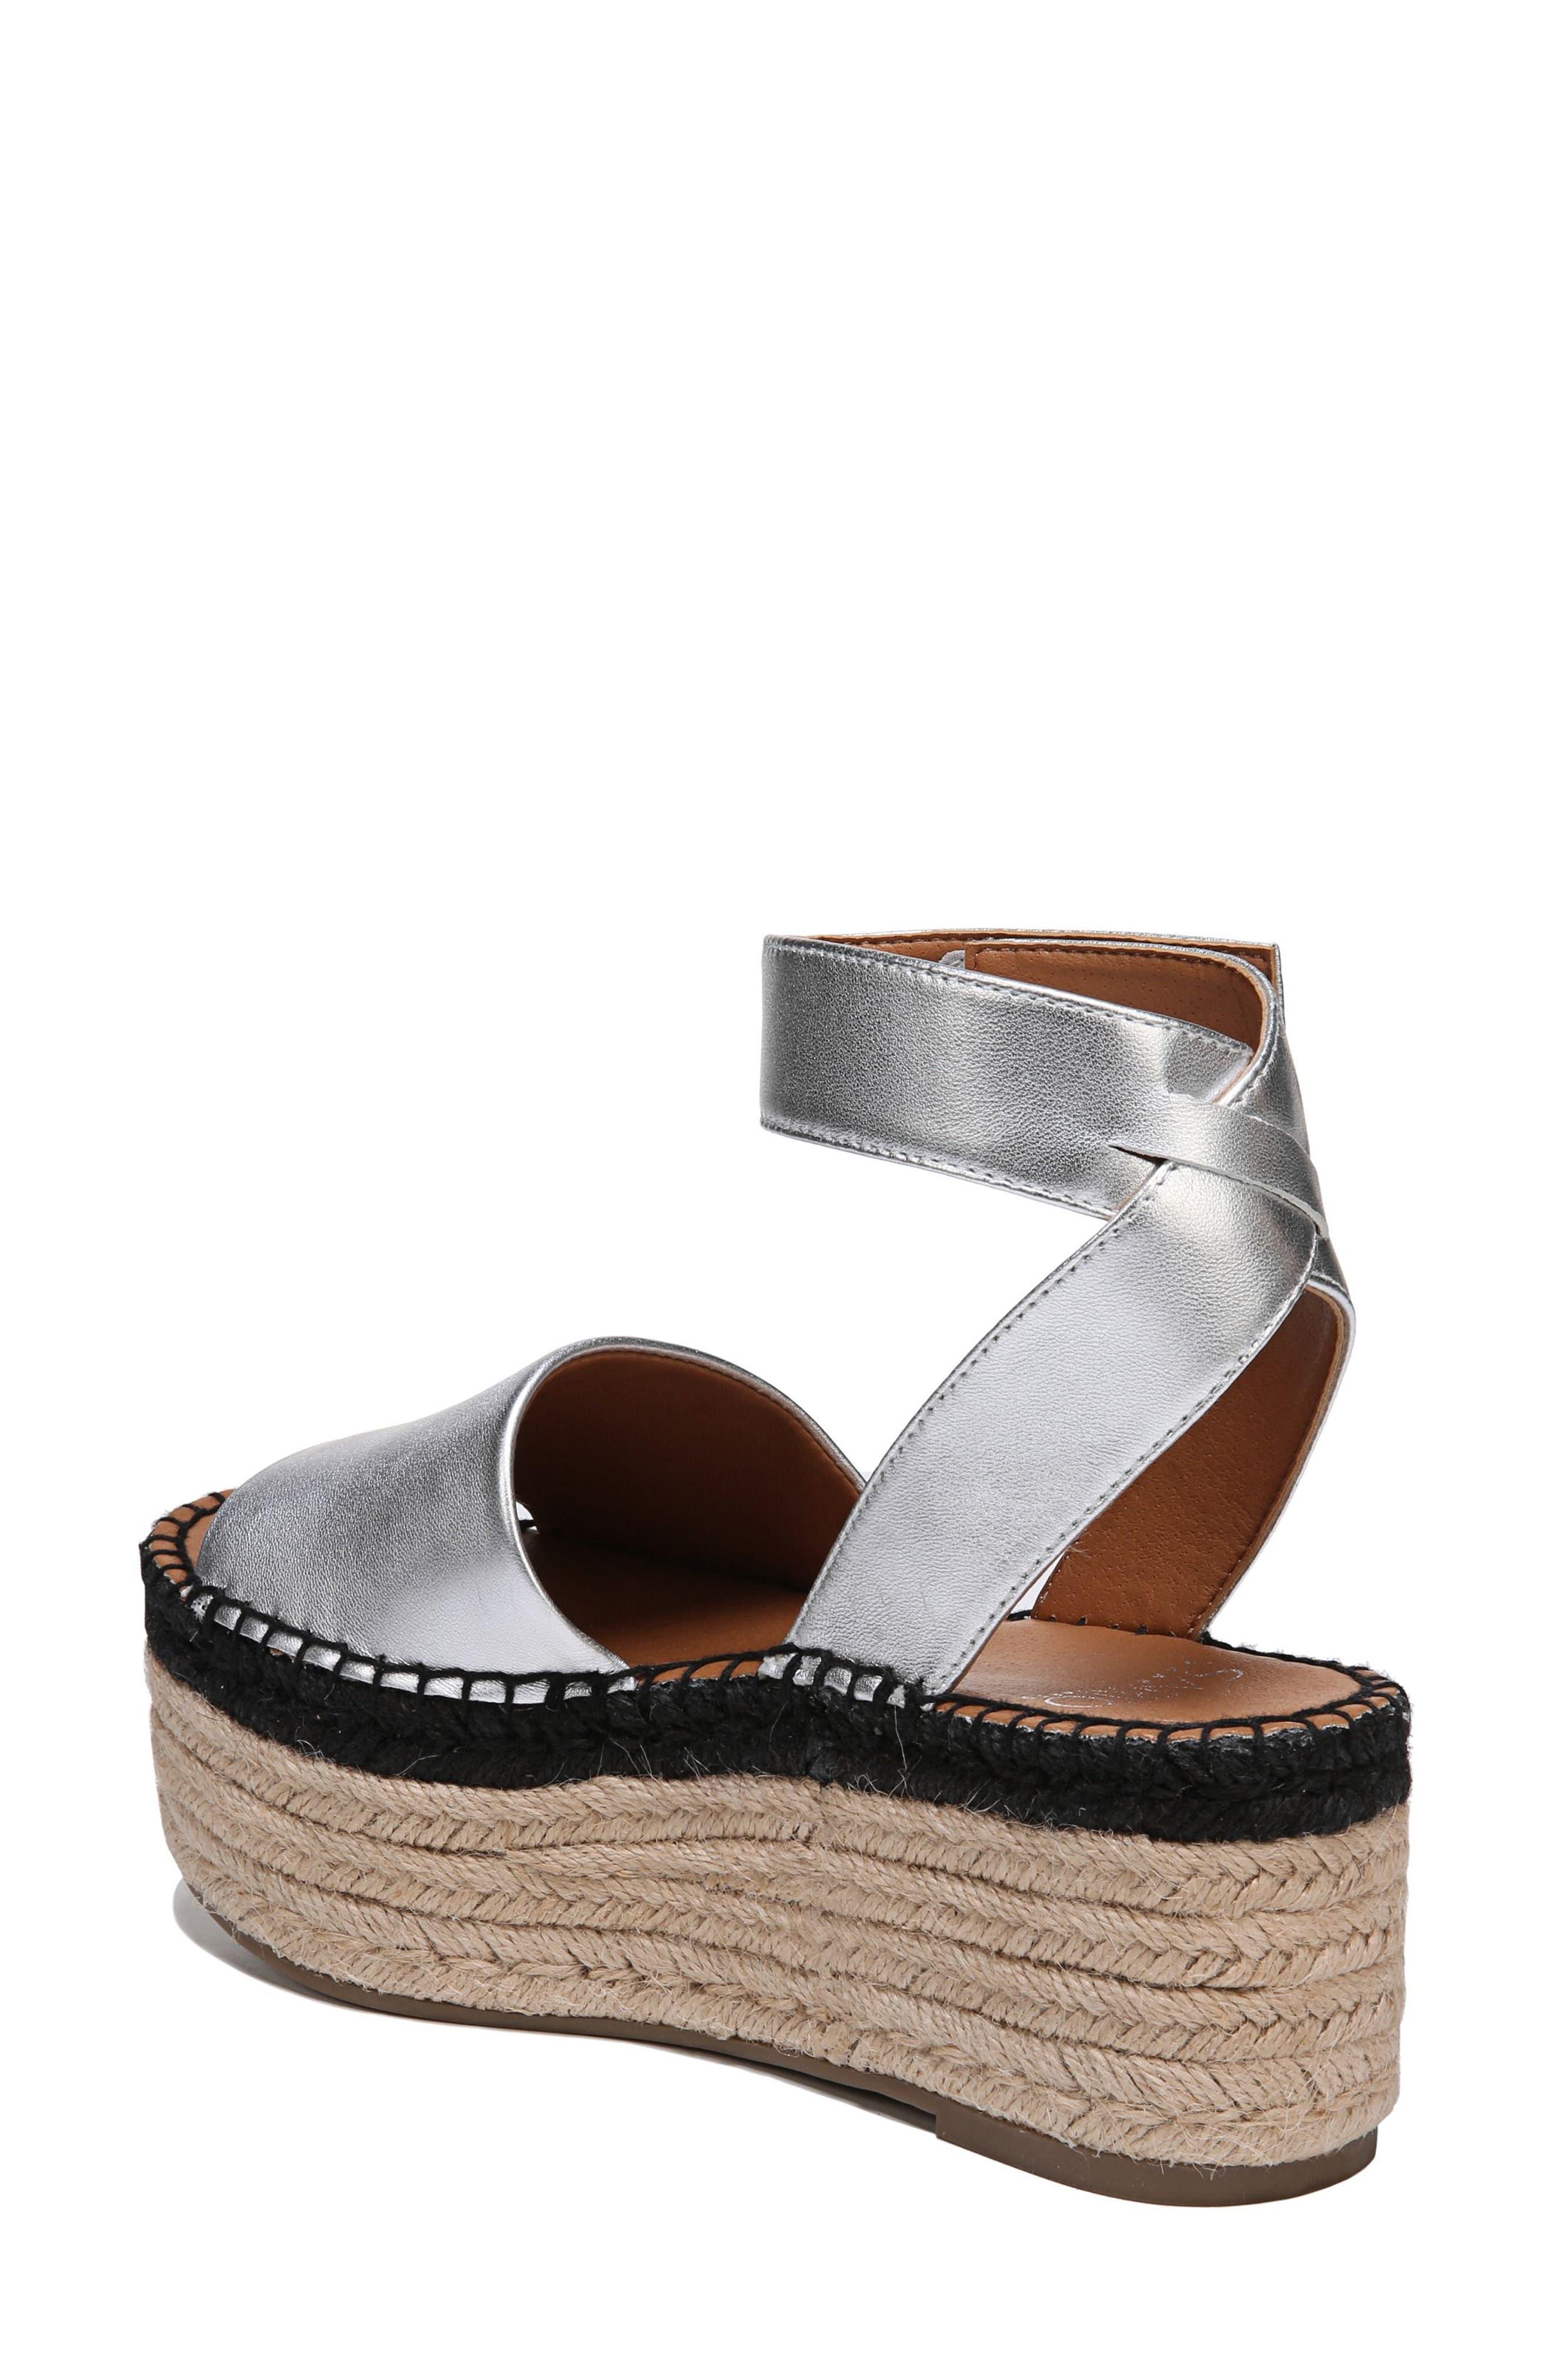 Maisi Platform Espadrille Sandal,                             Alternate thumbnail 2, color,                             Silver Leather